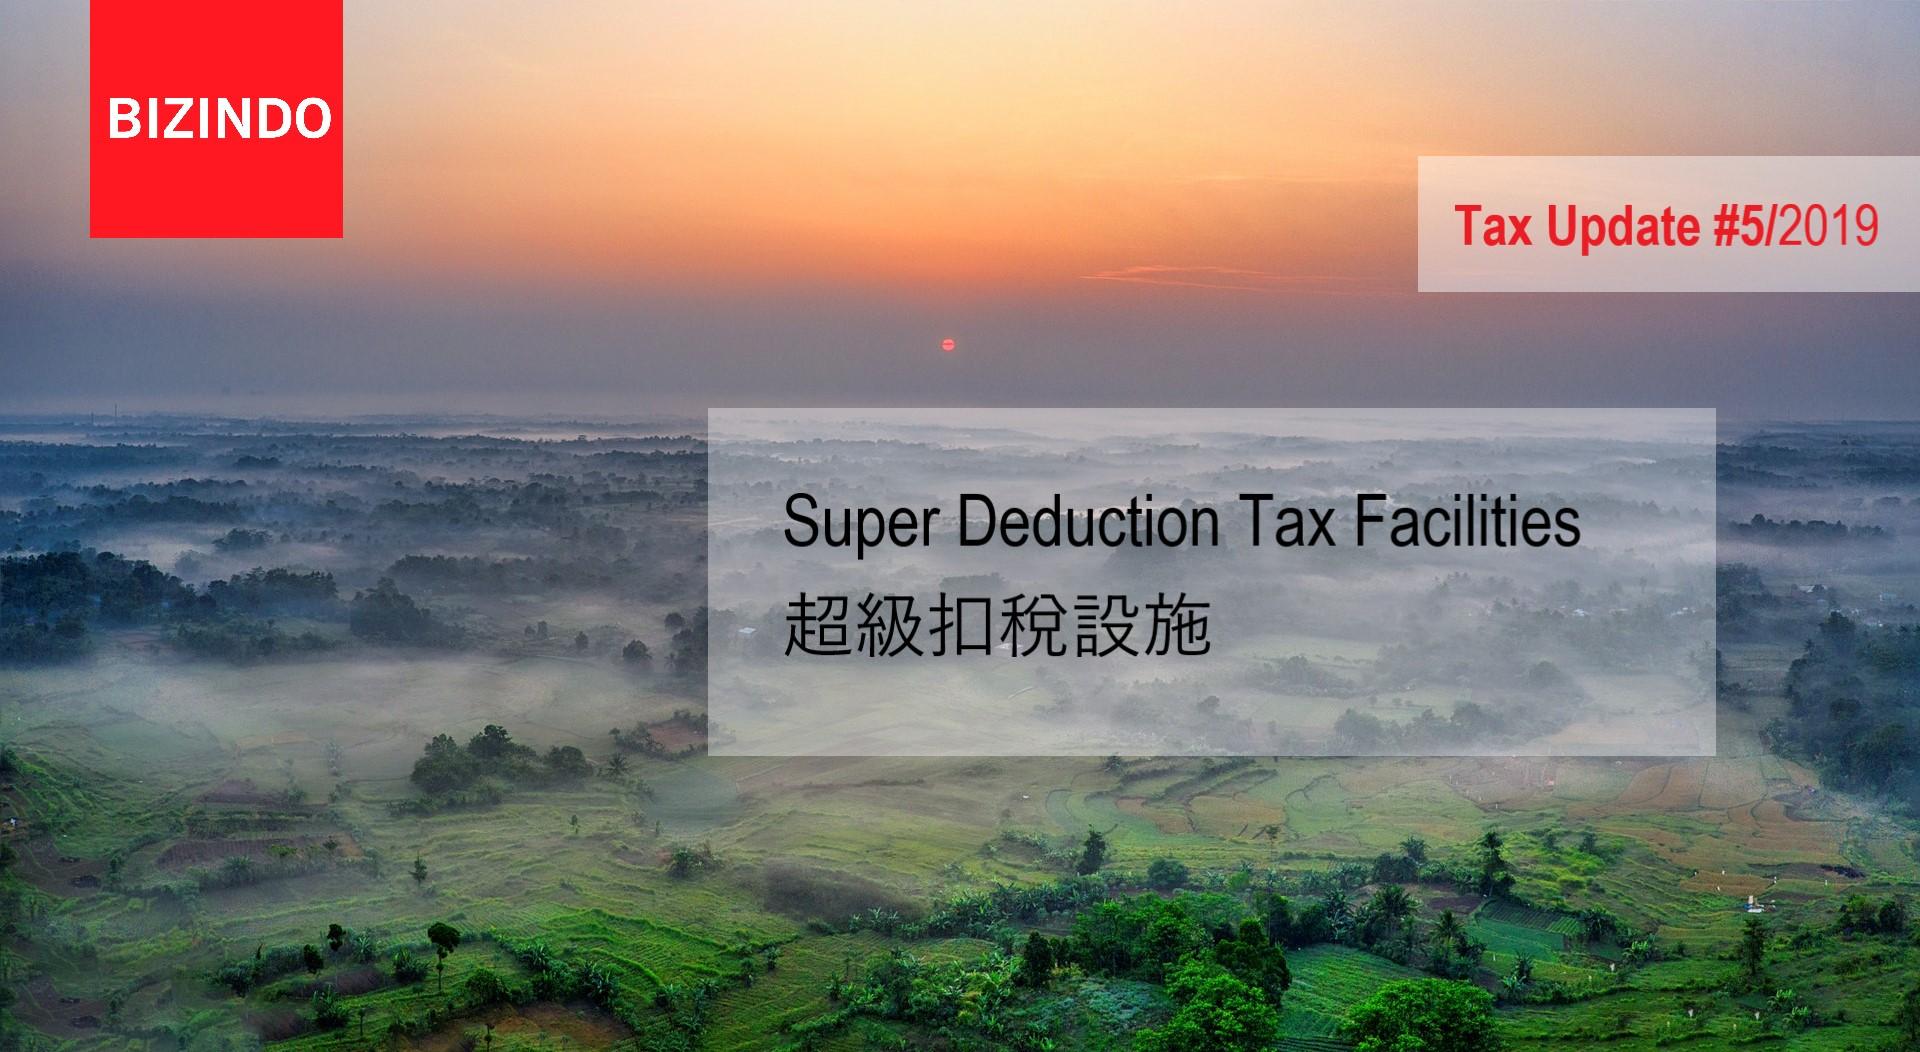 Super Deduction Tax Facilities 超級扣稅設施